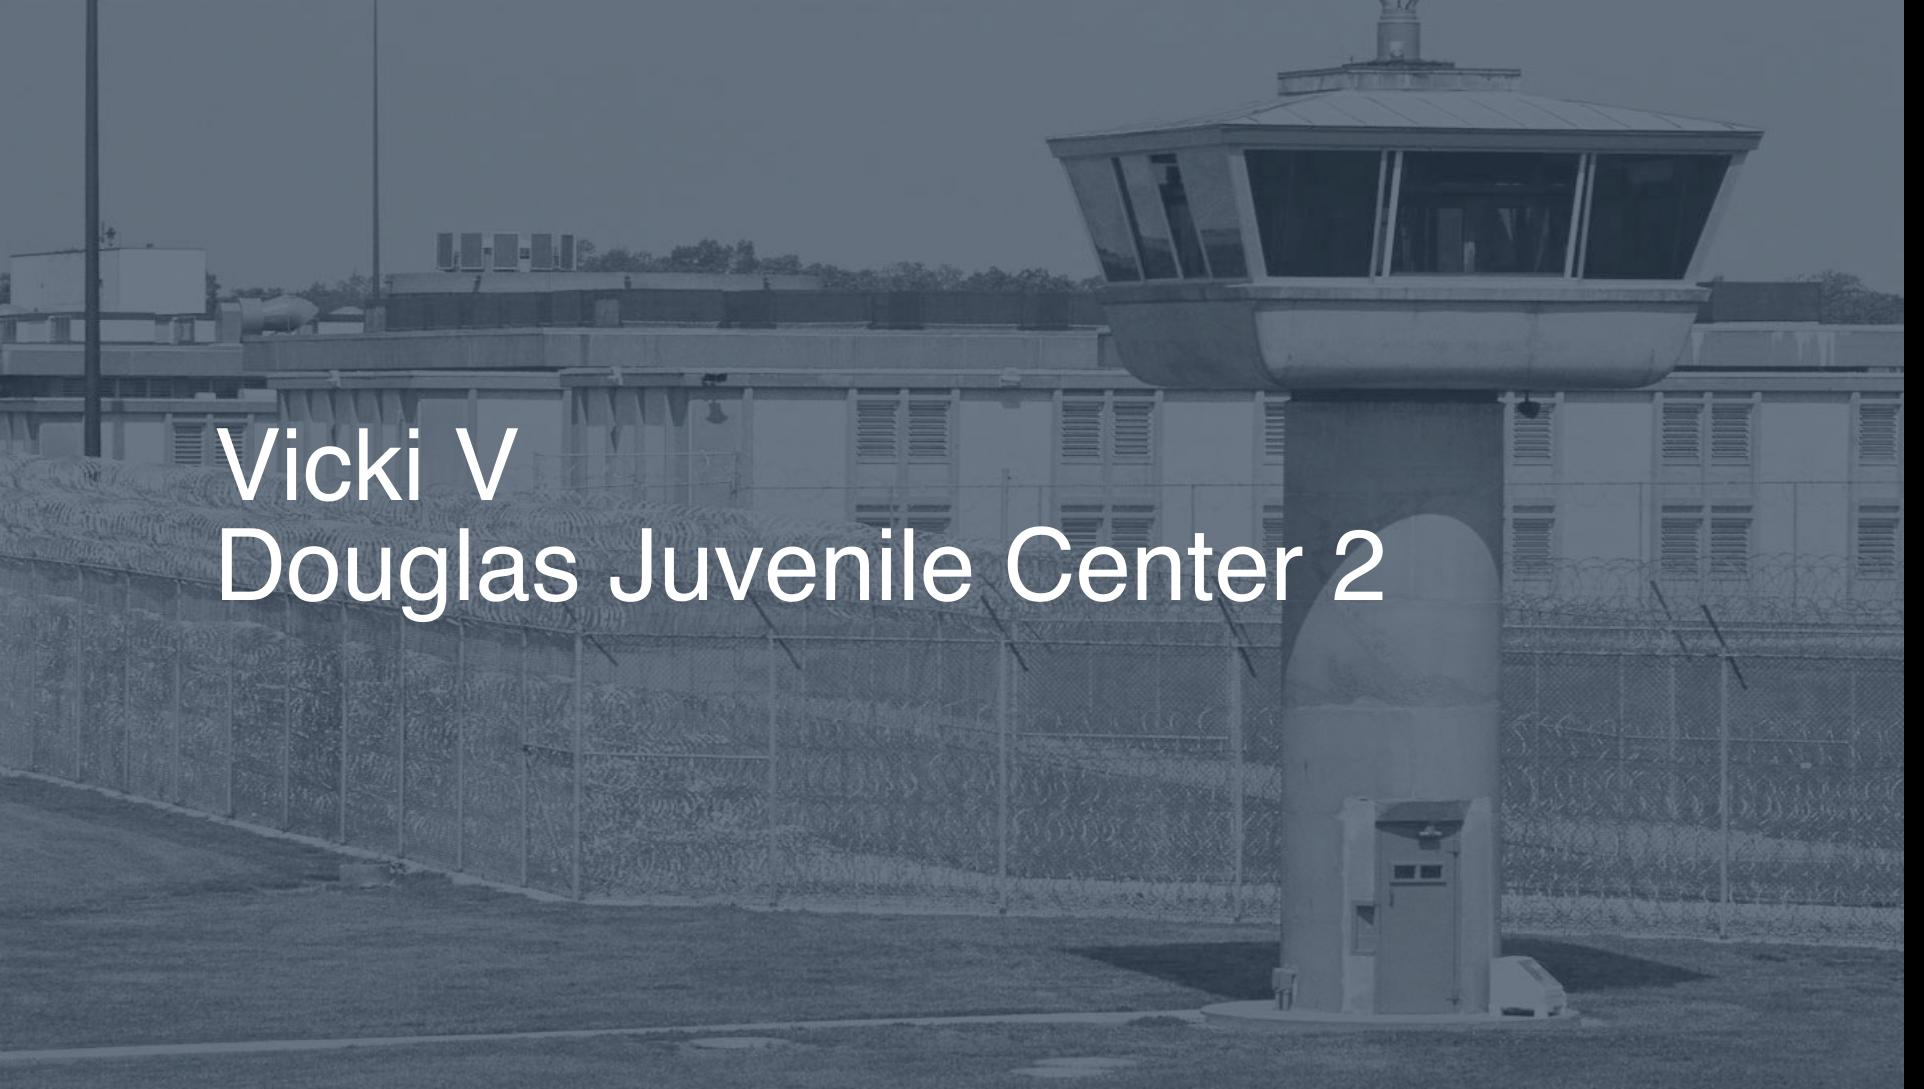 Vicki V. Douglas Juvenile Center correctional facility picture